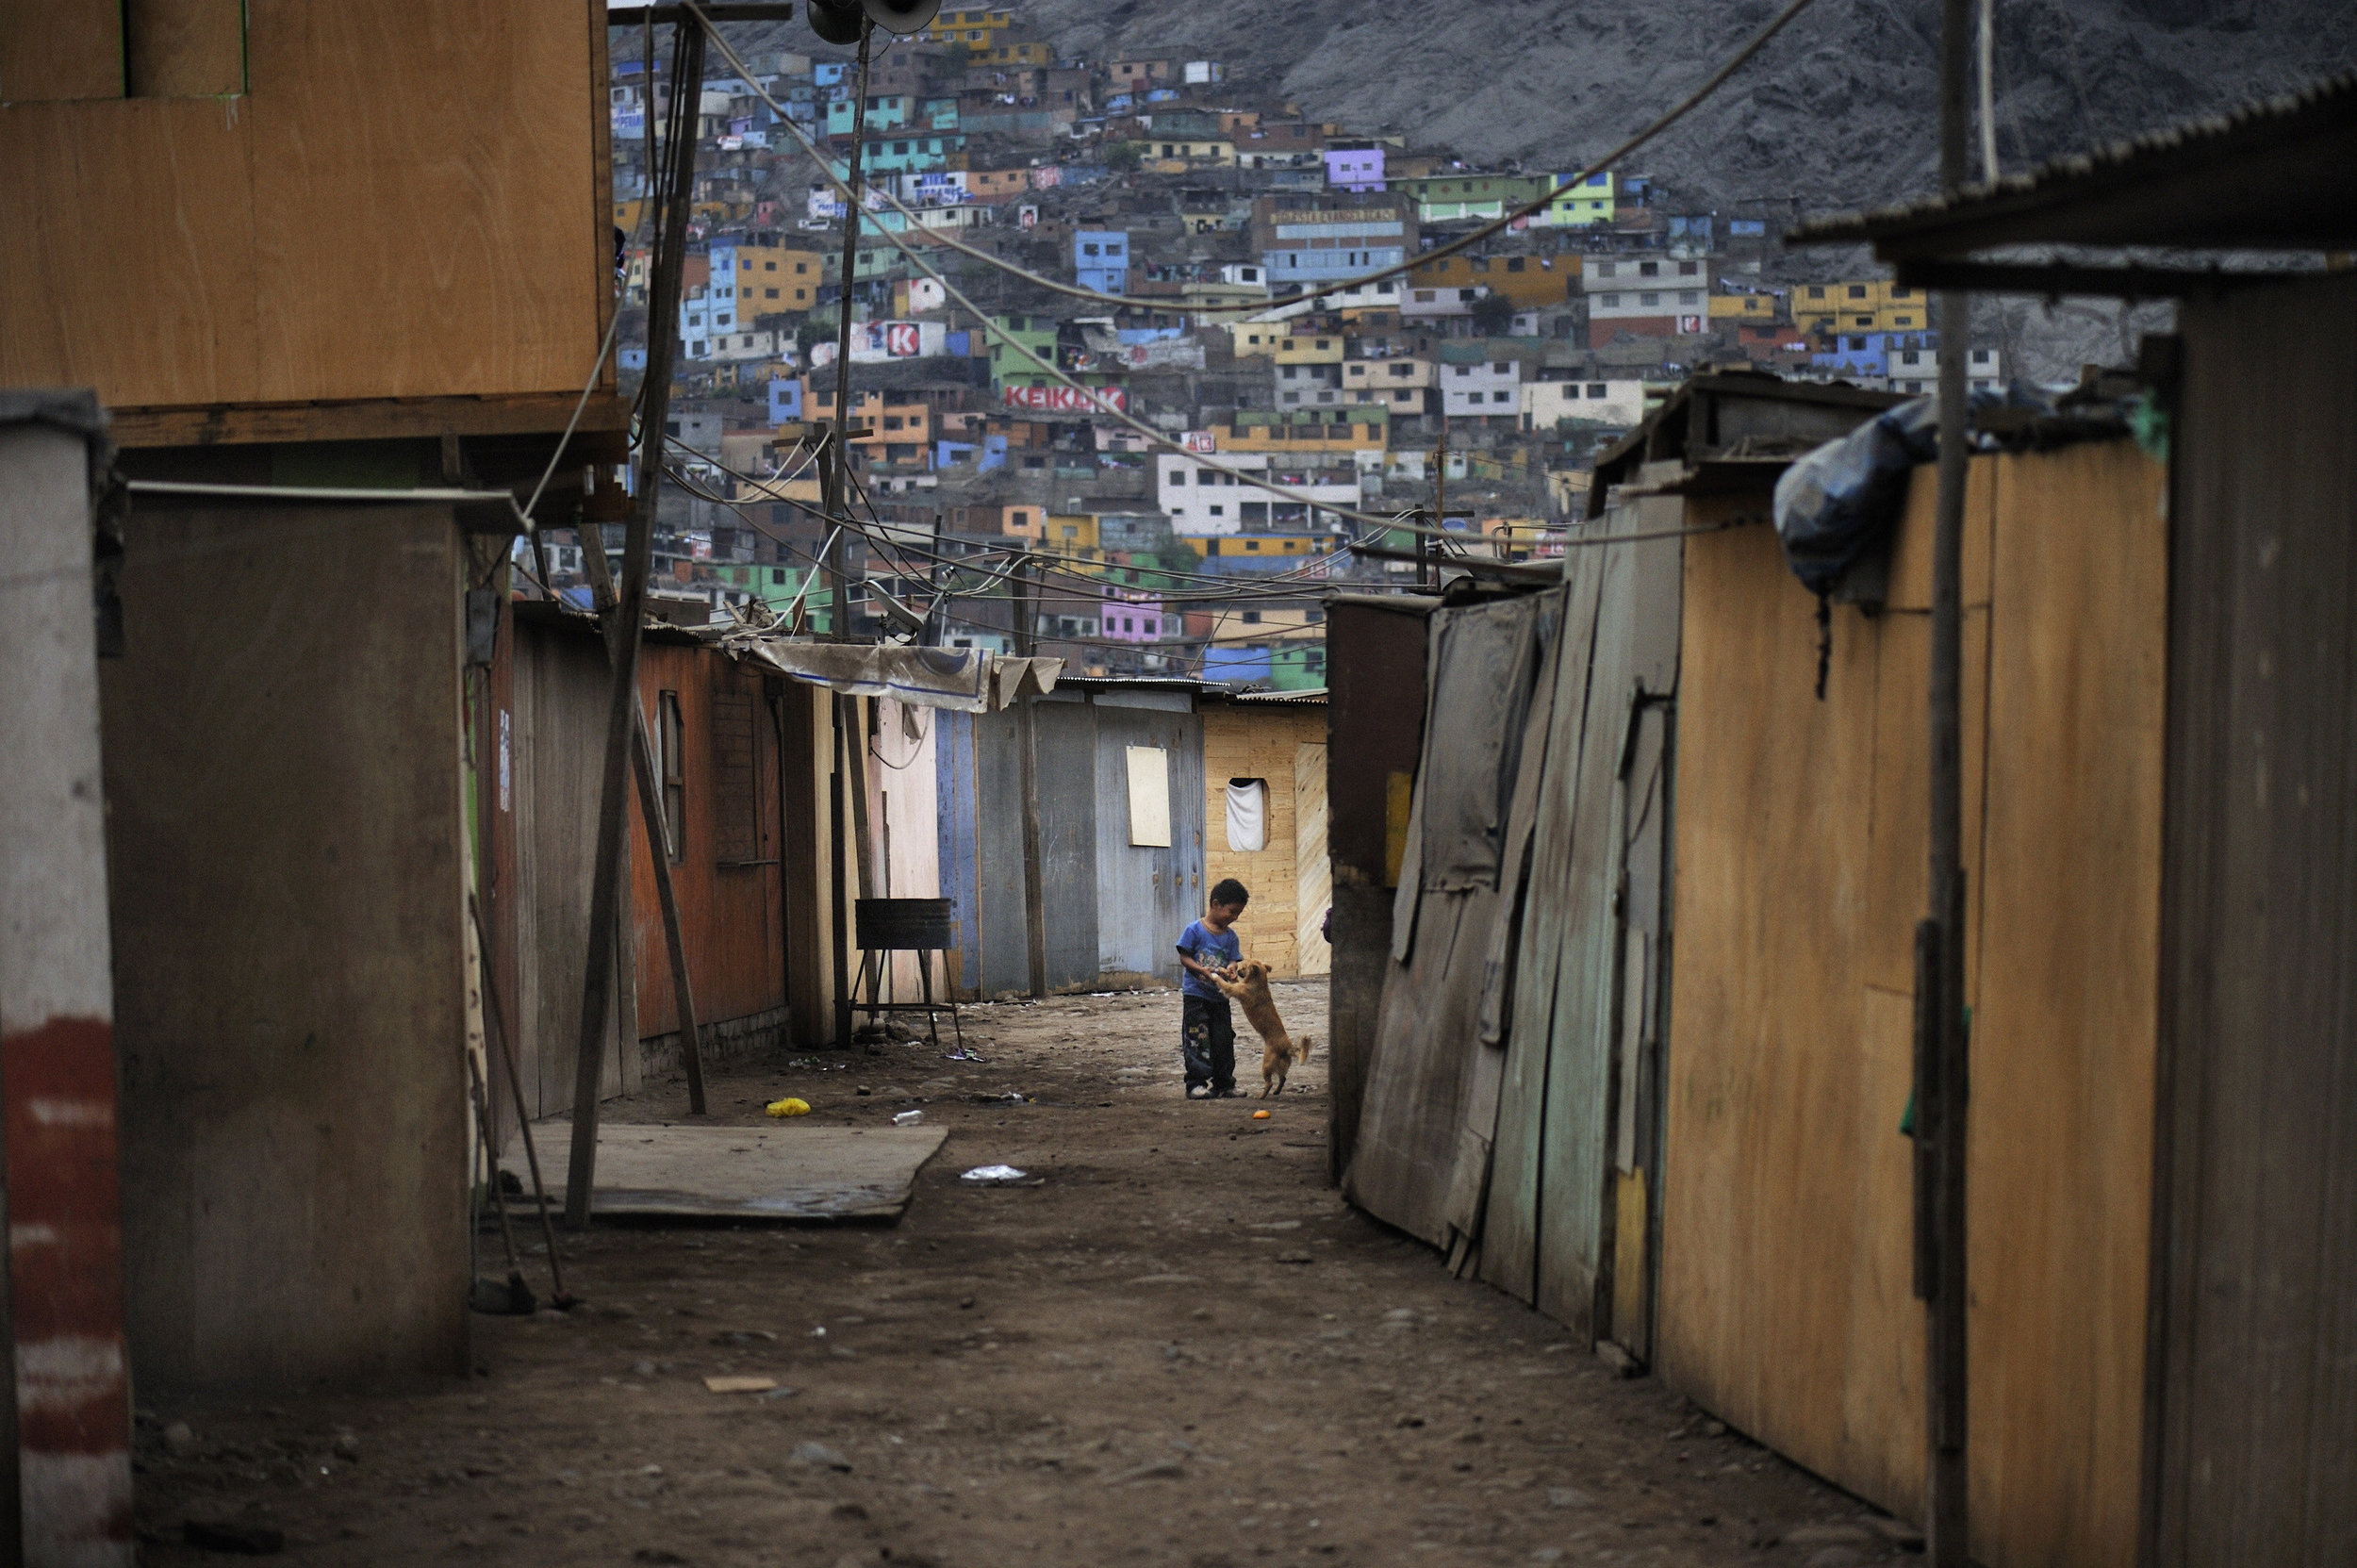 Indigenous Urban Life